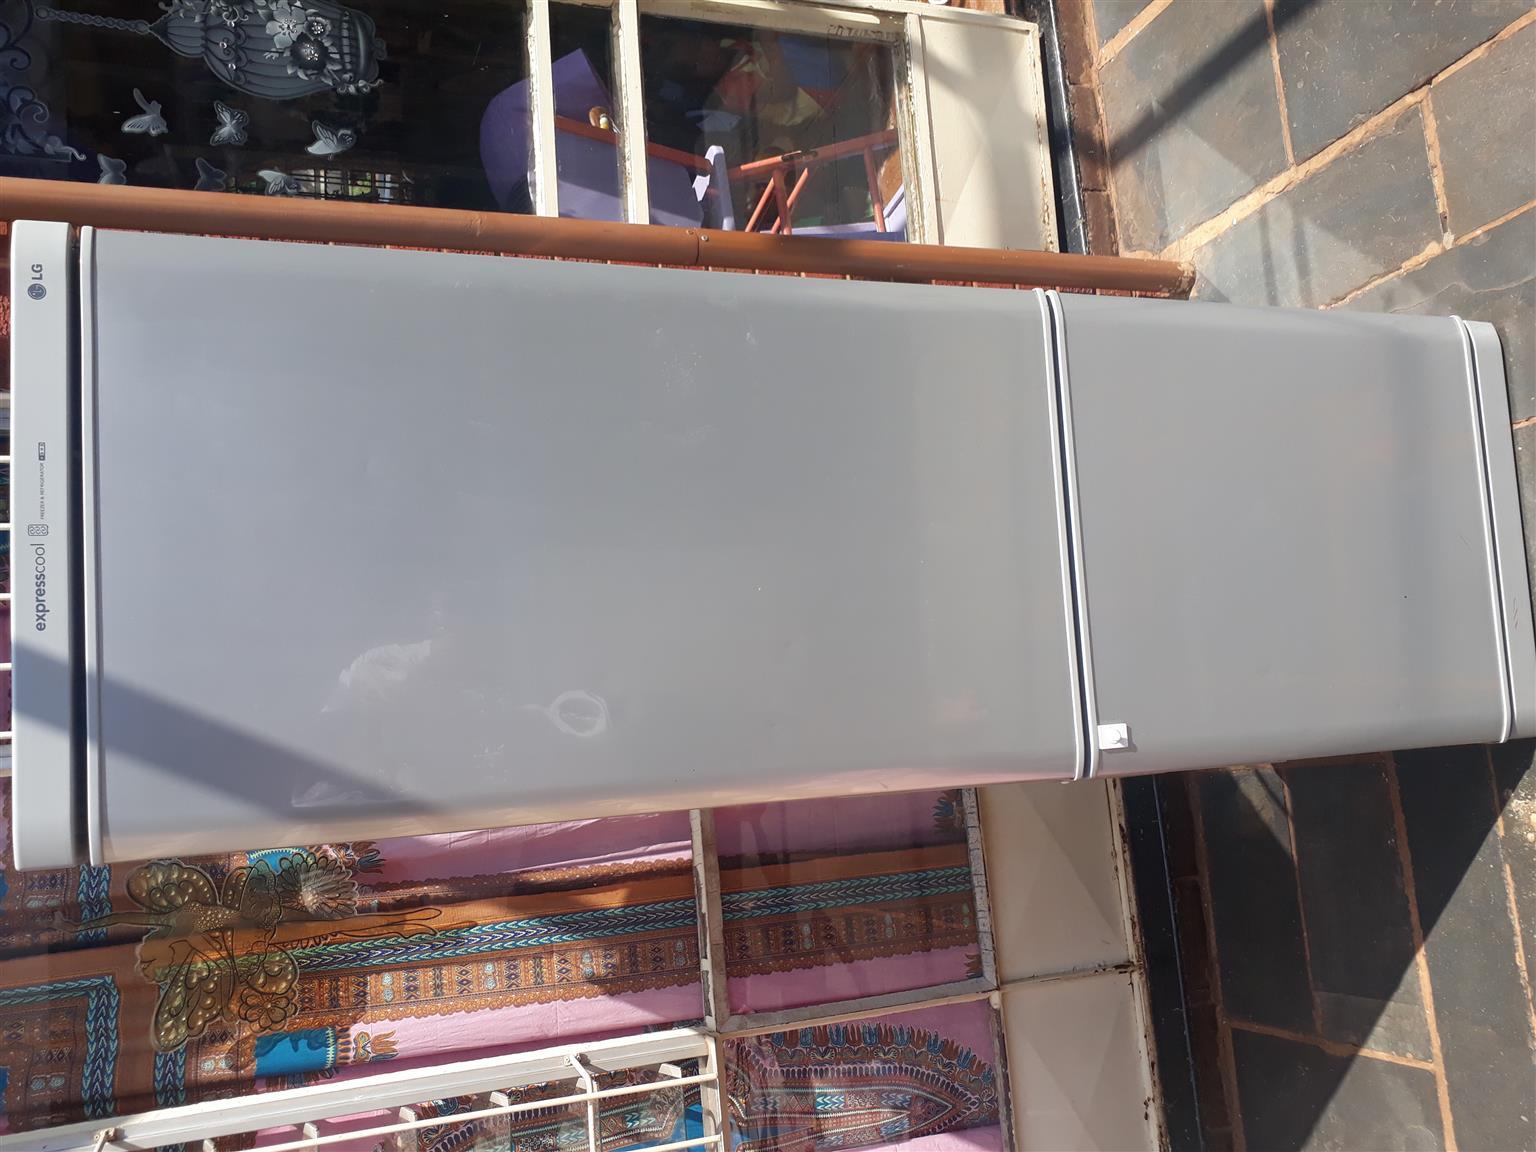 379 Liter LG Fridge Freezer